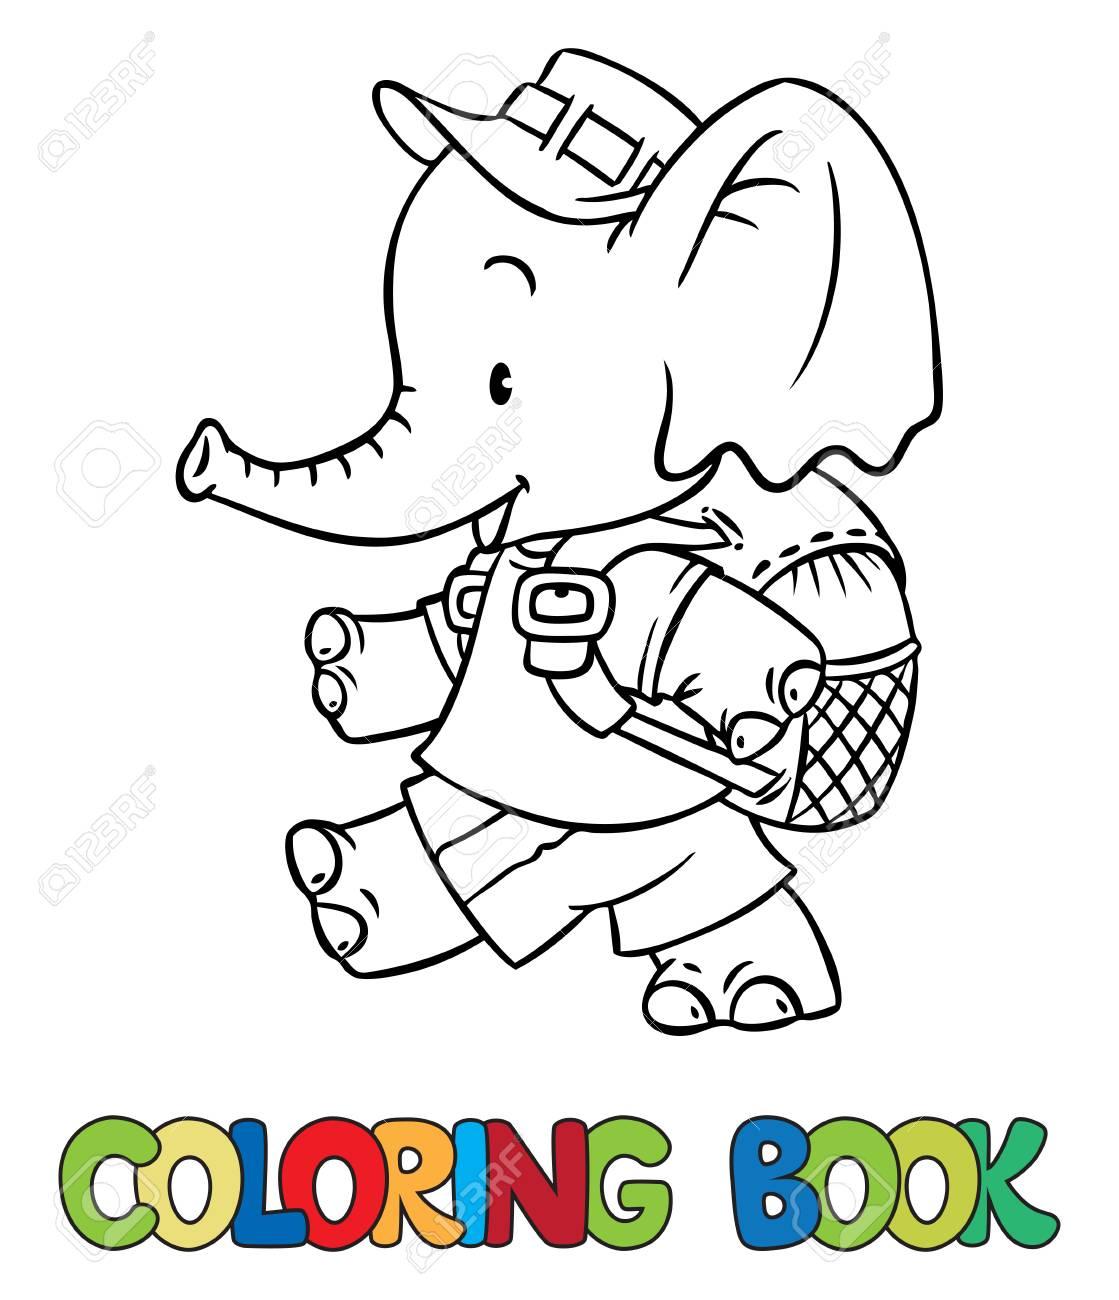 Coloriage Bebe Elephant.Livre De Coloriage De Drole De Petit Bebe Elephant Drole Avec Sac A